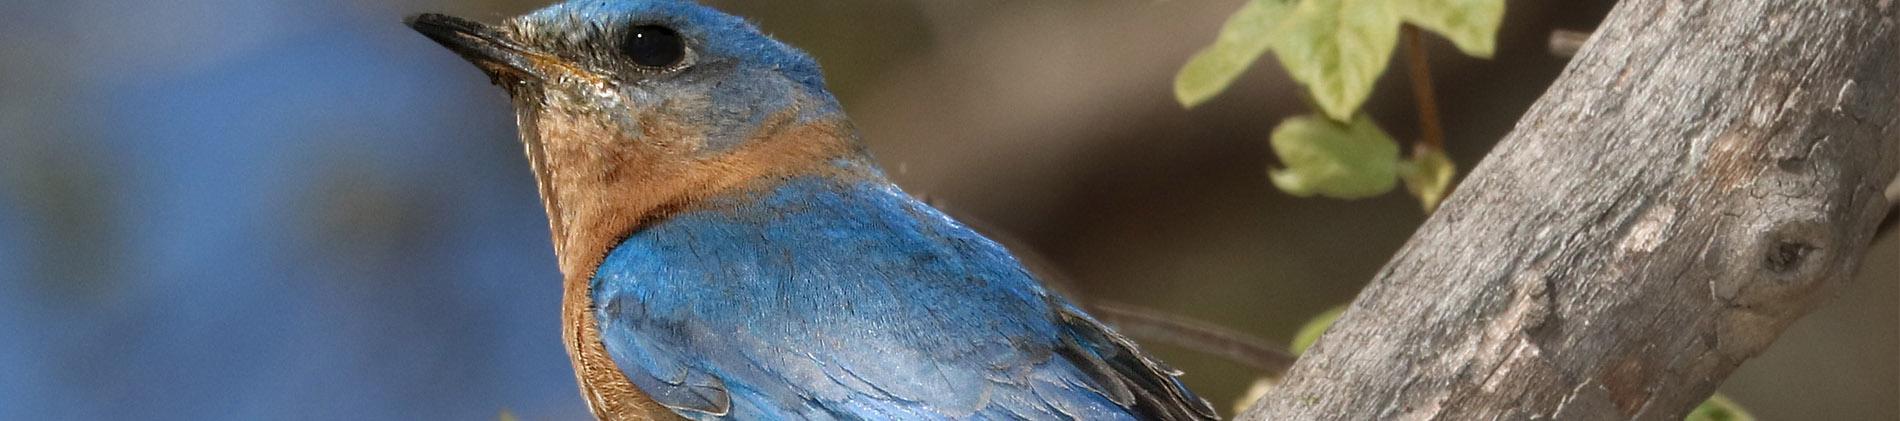 Image of an Eastern Bluebird